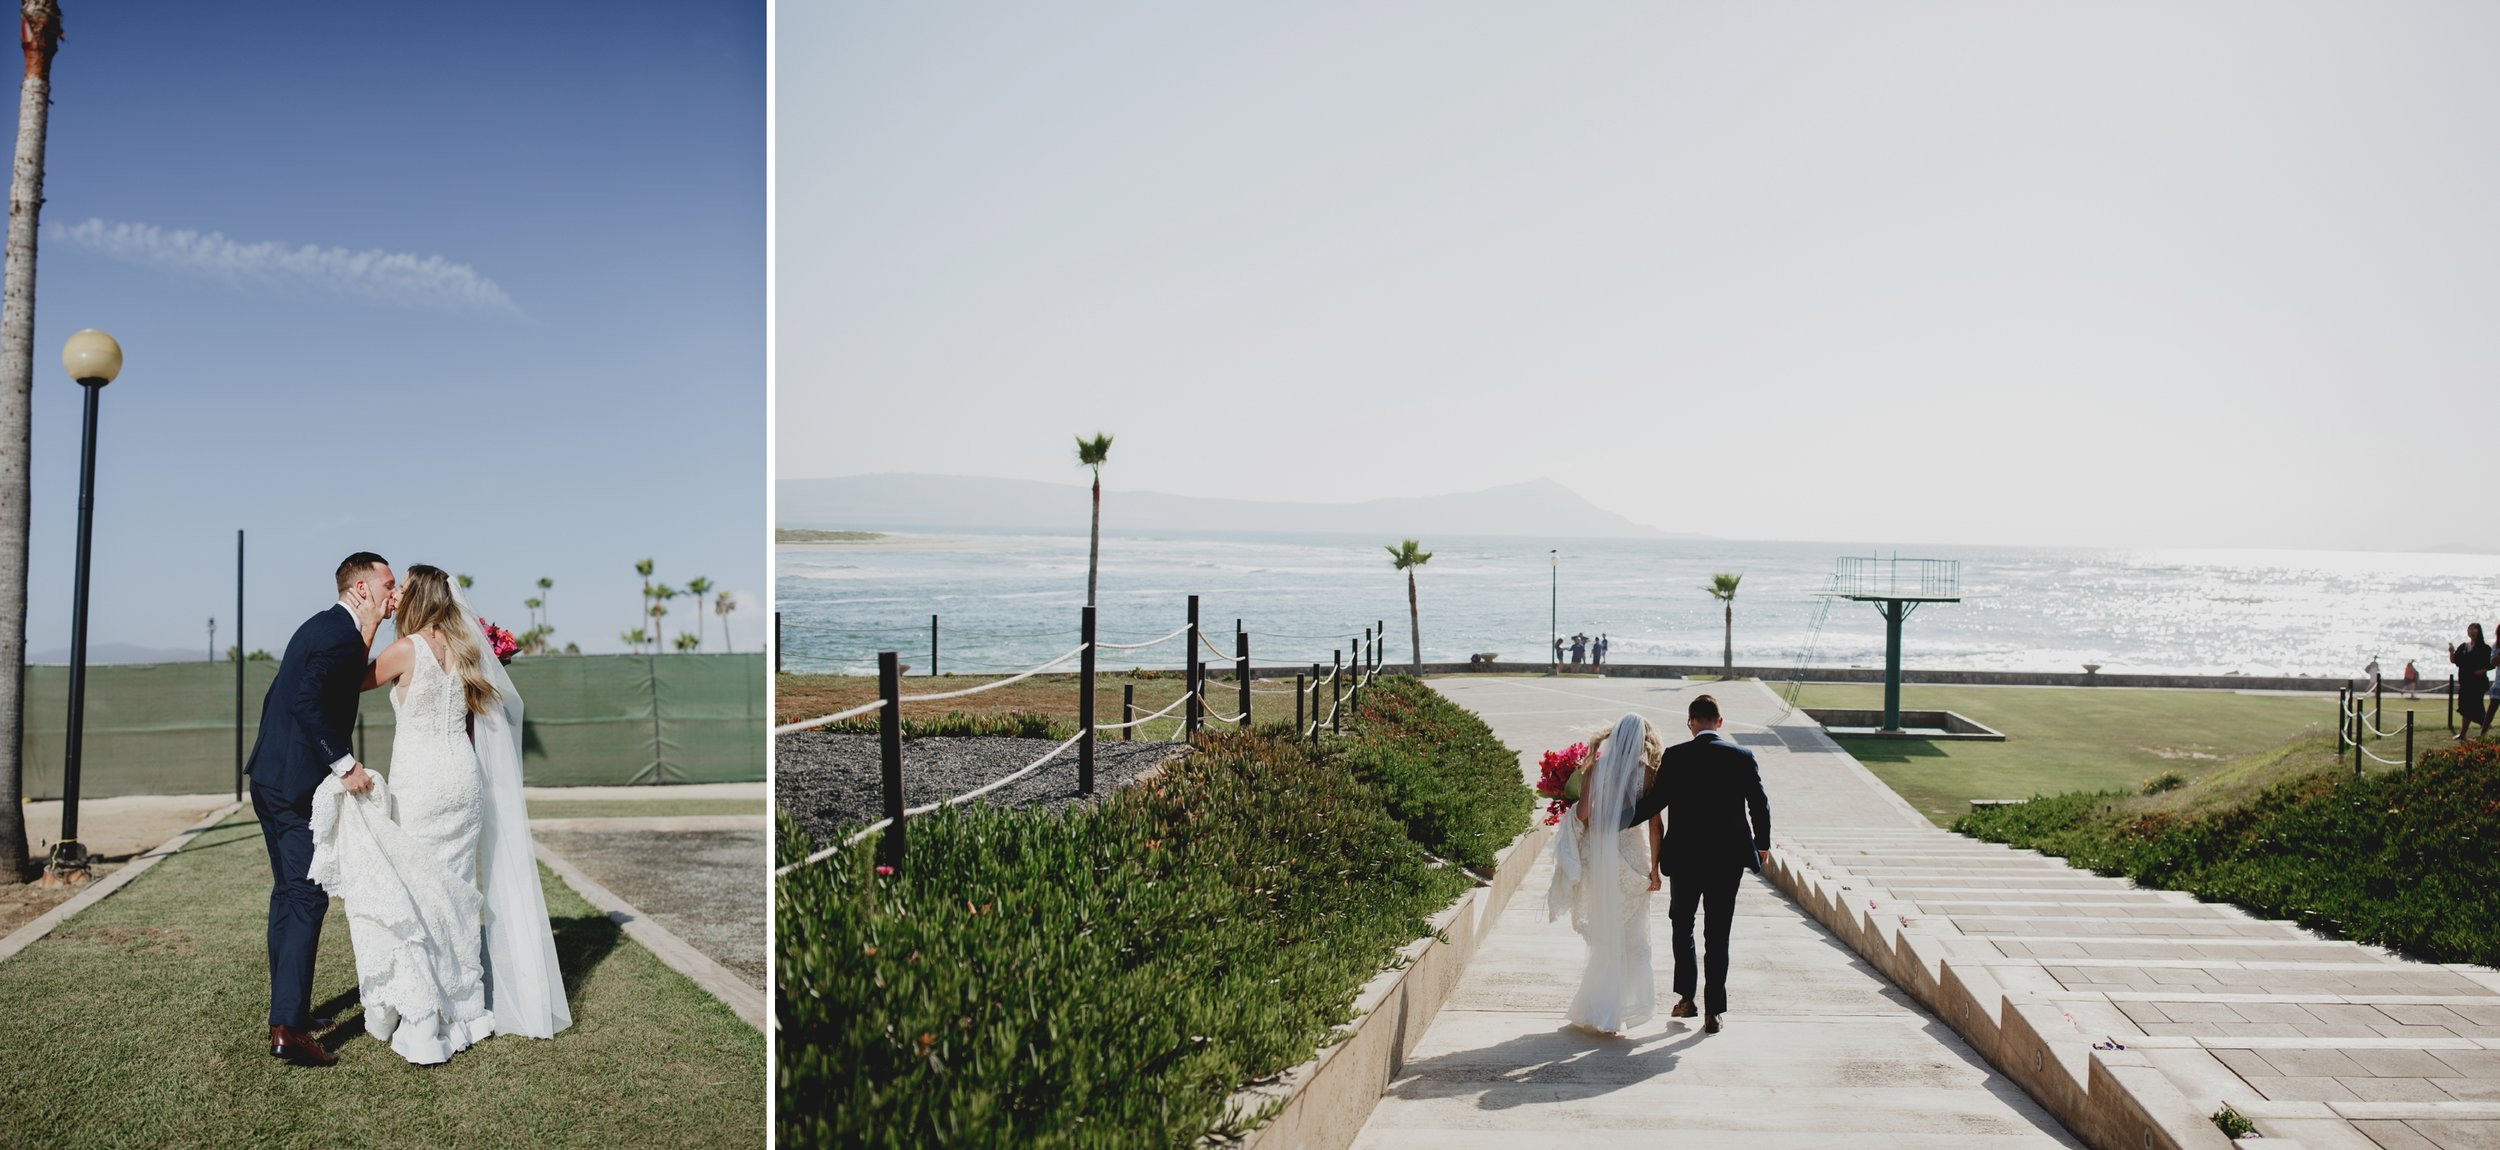 amandavanvels_ensenada_mexico_wedding_052.jpg